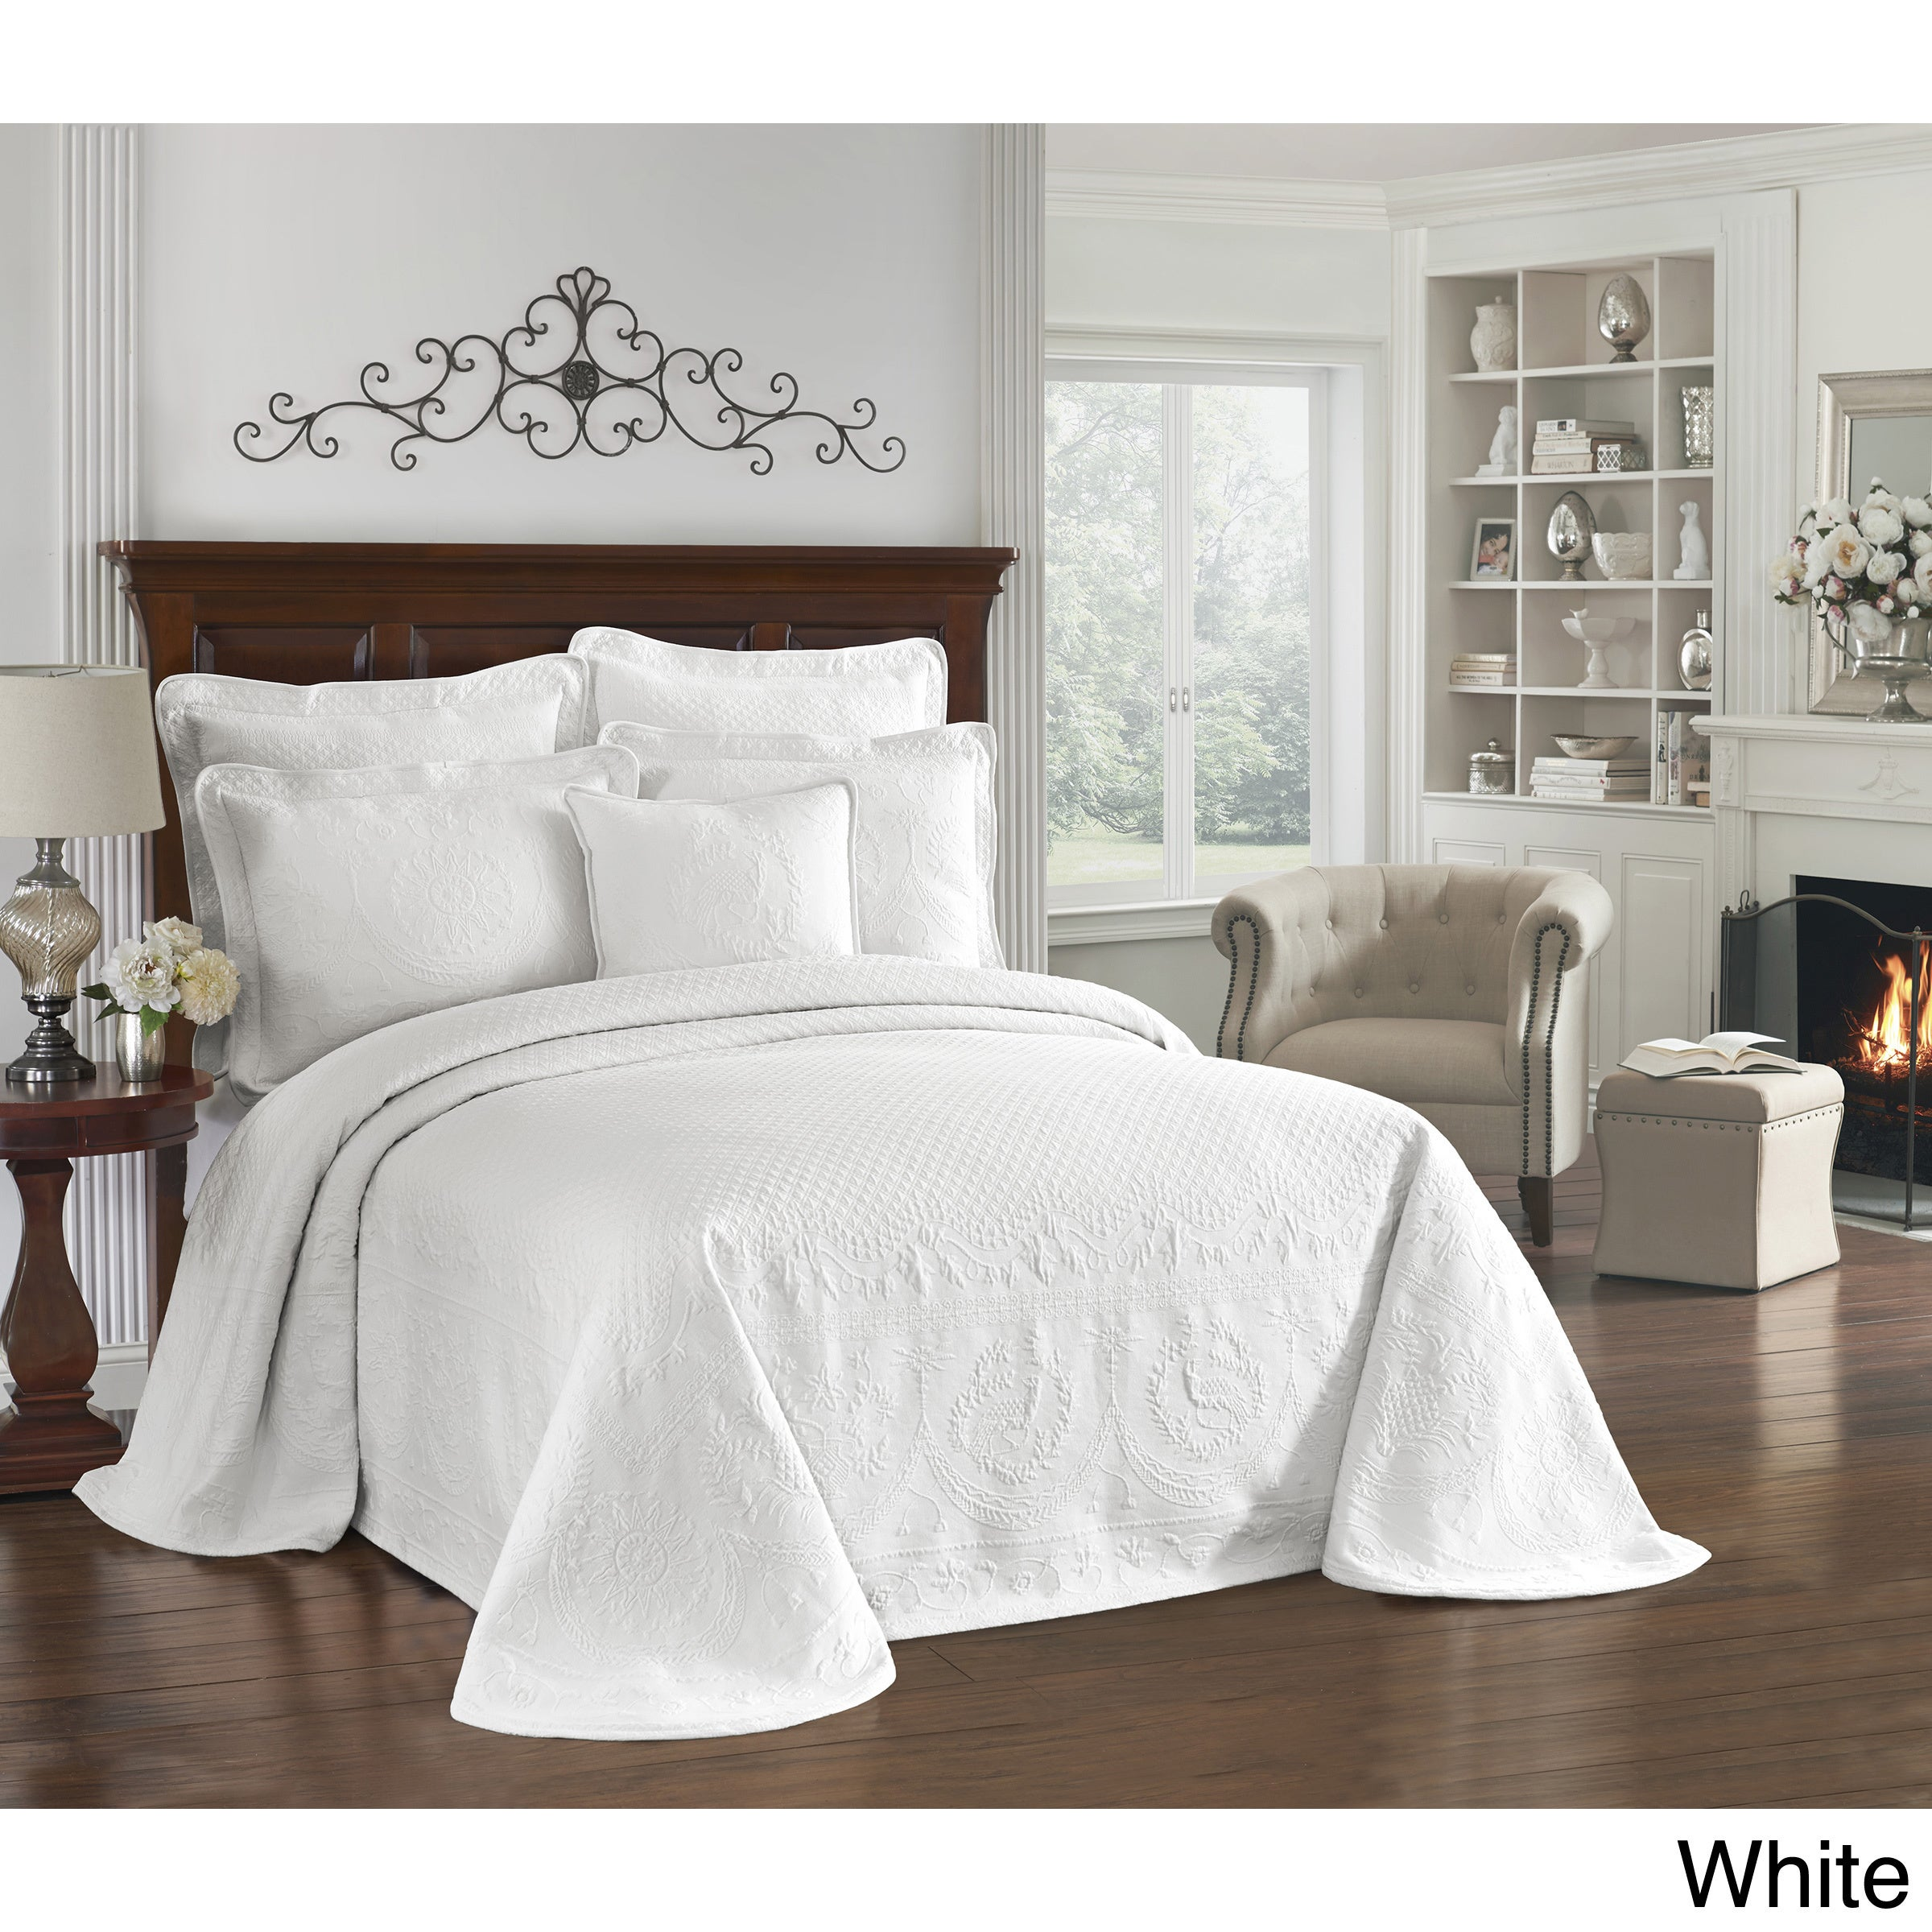 bedding p bedspread cotton woven americana matelasse bed